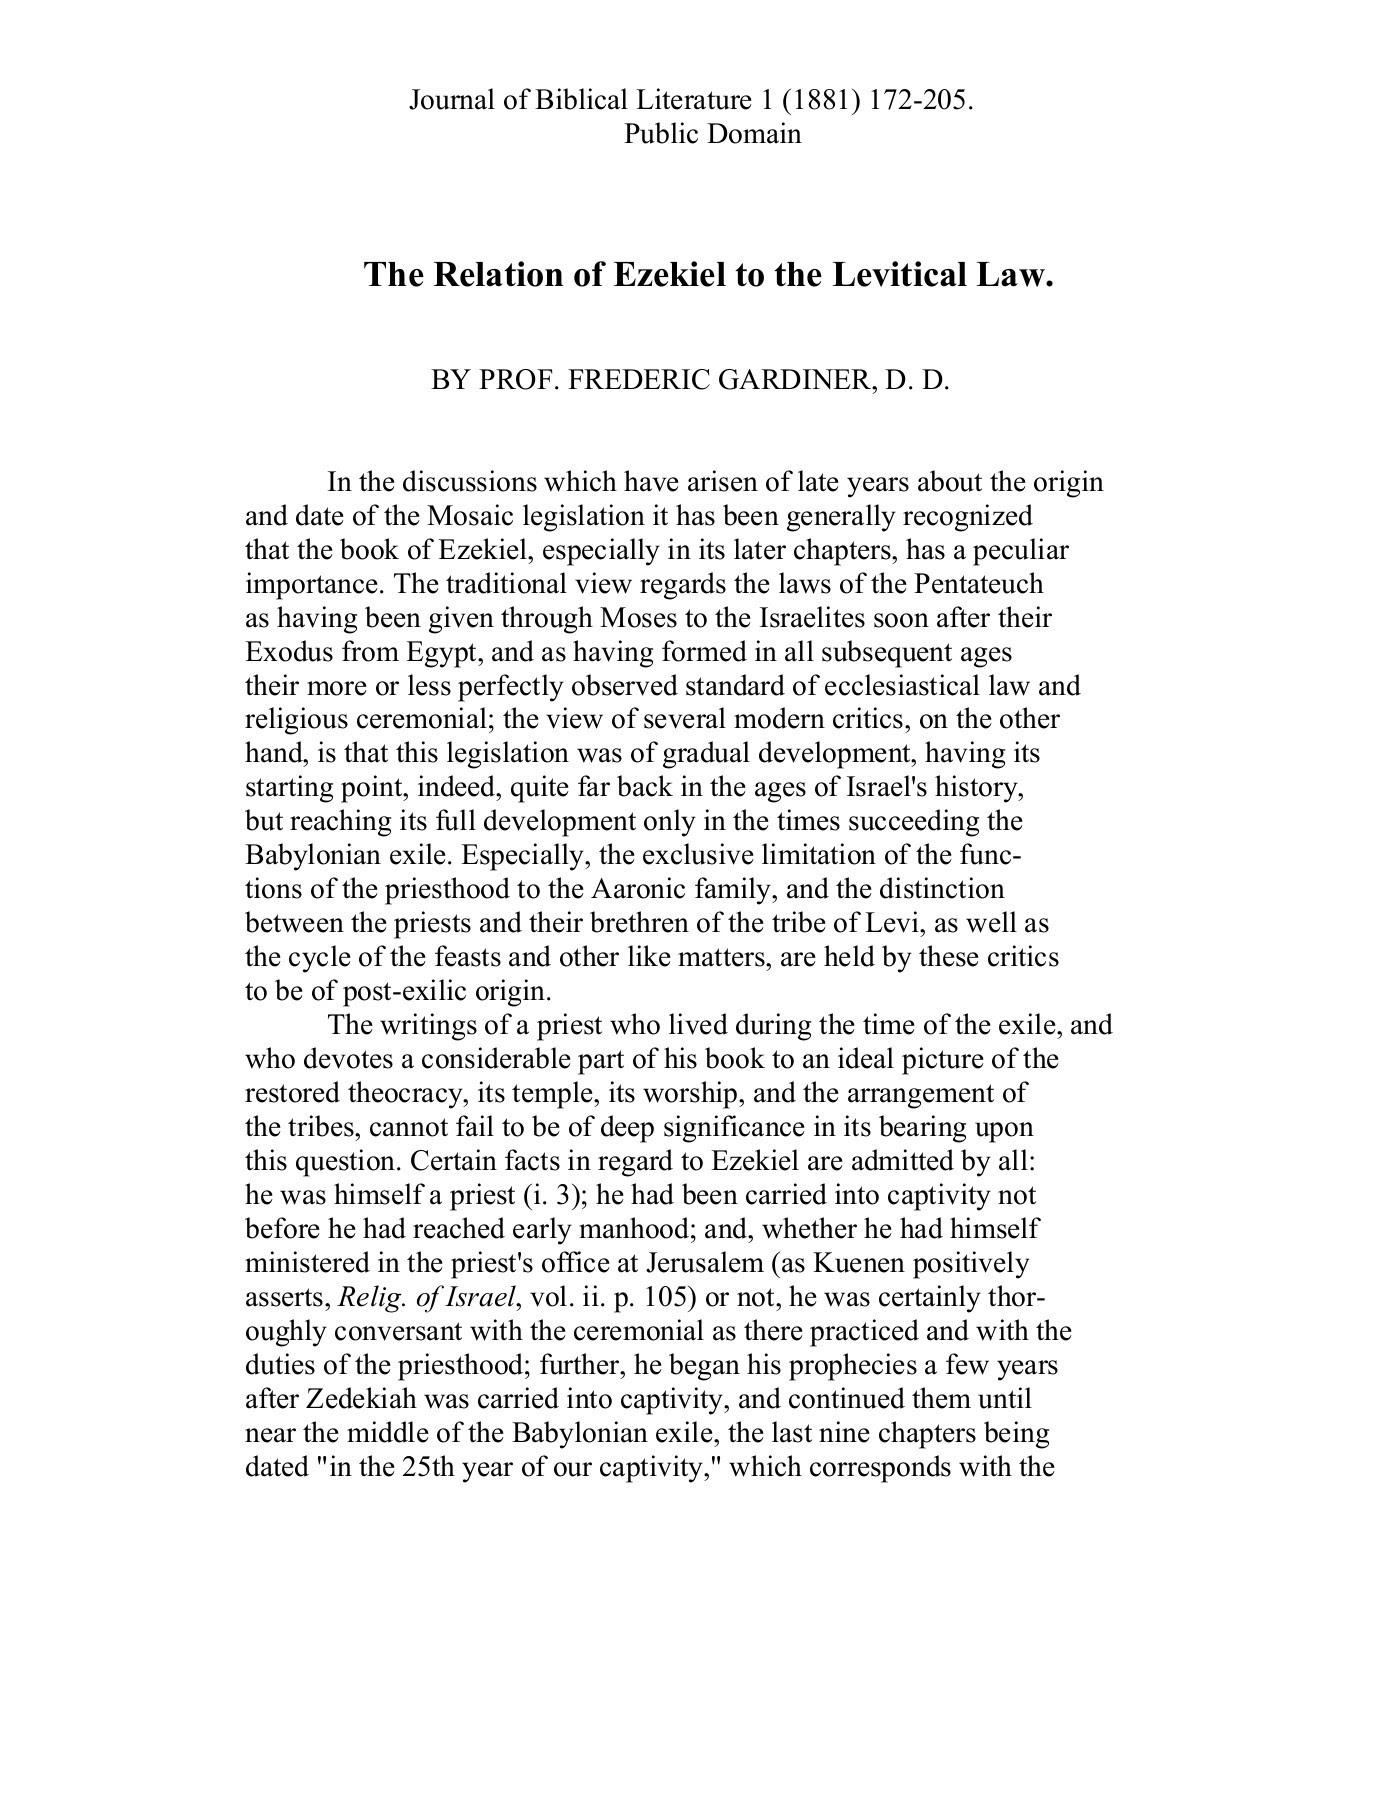 Undergraduate dissertation publishing